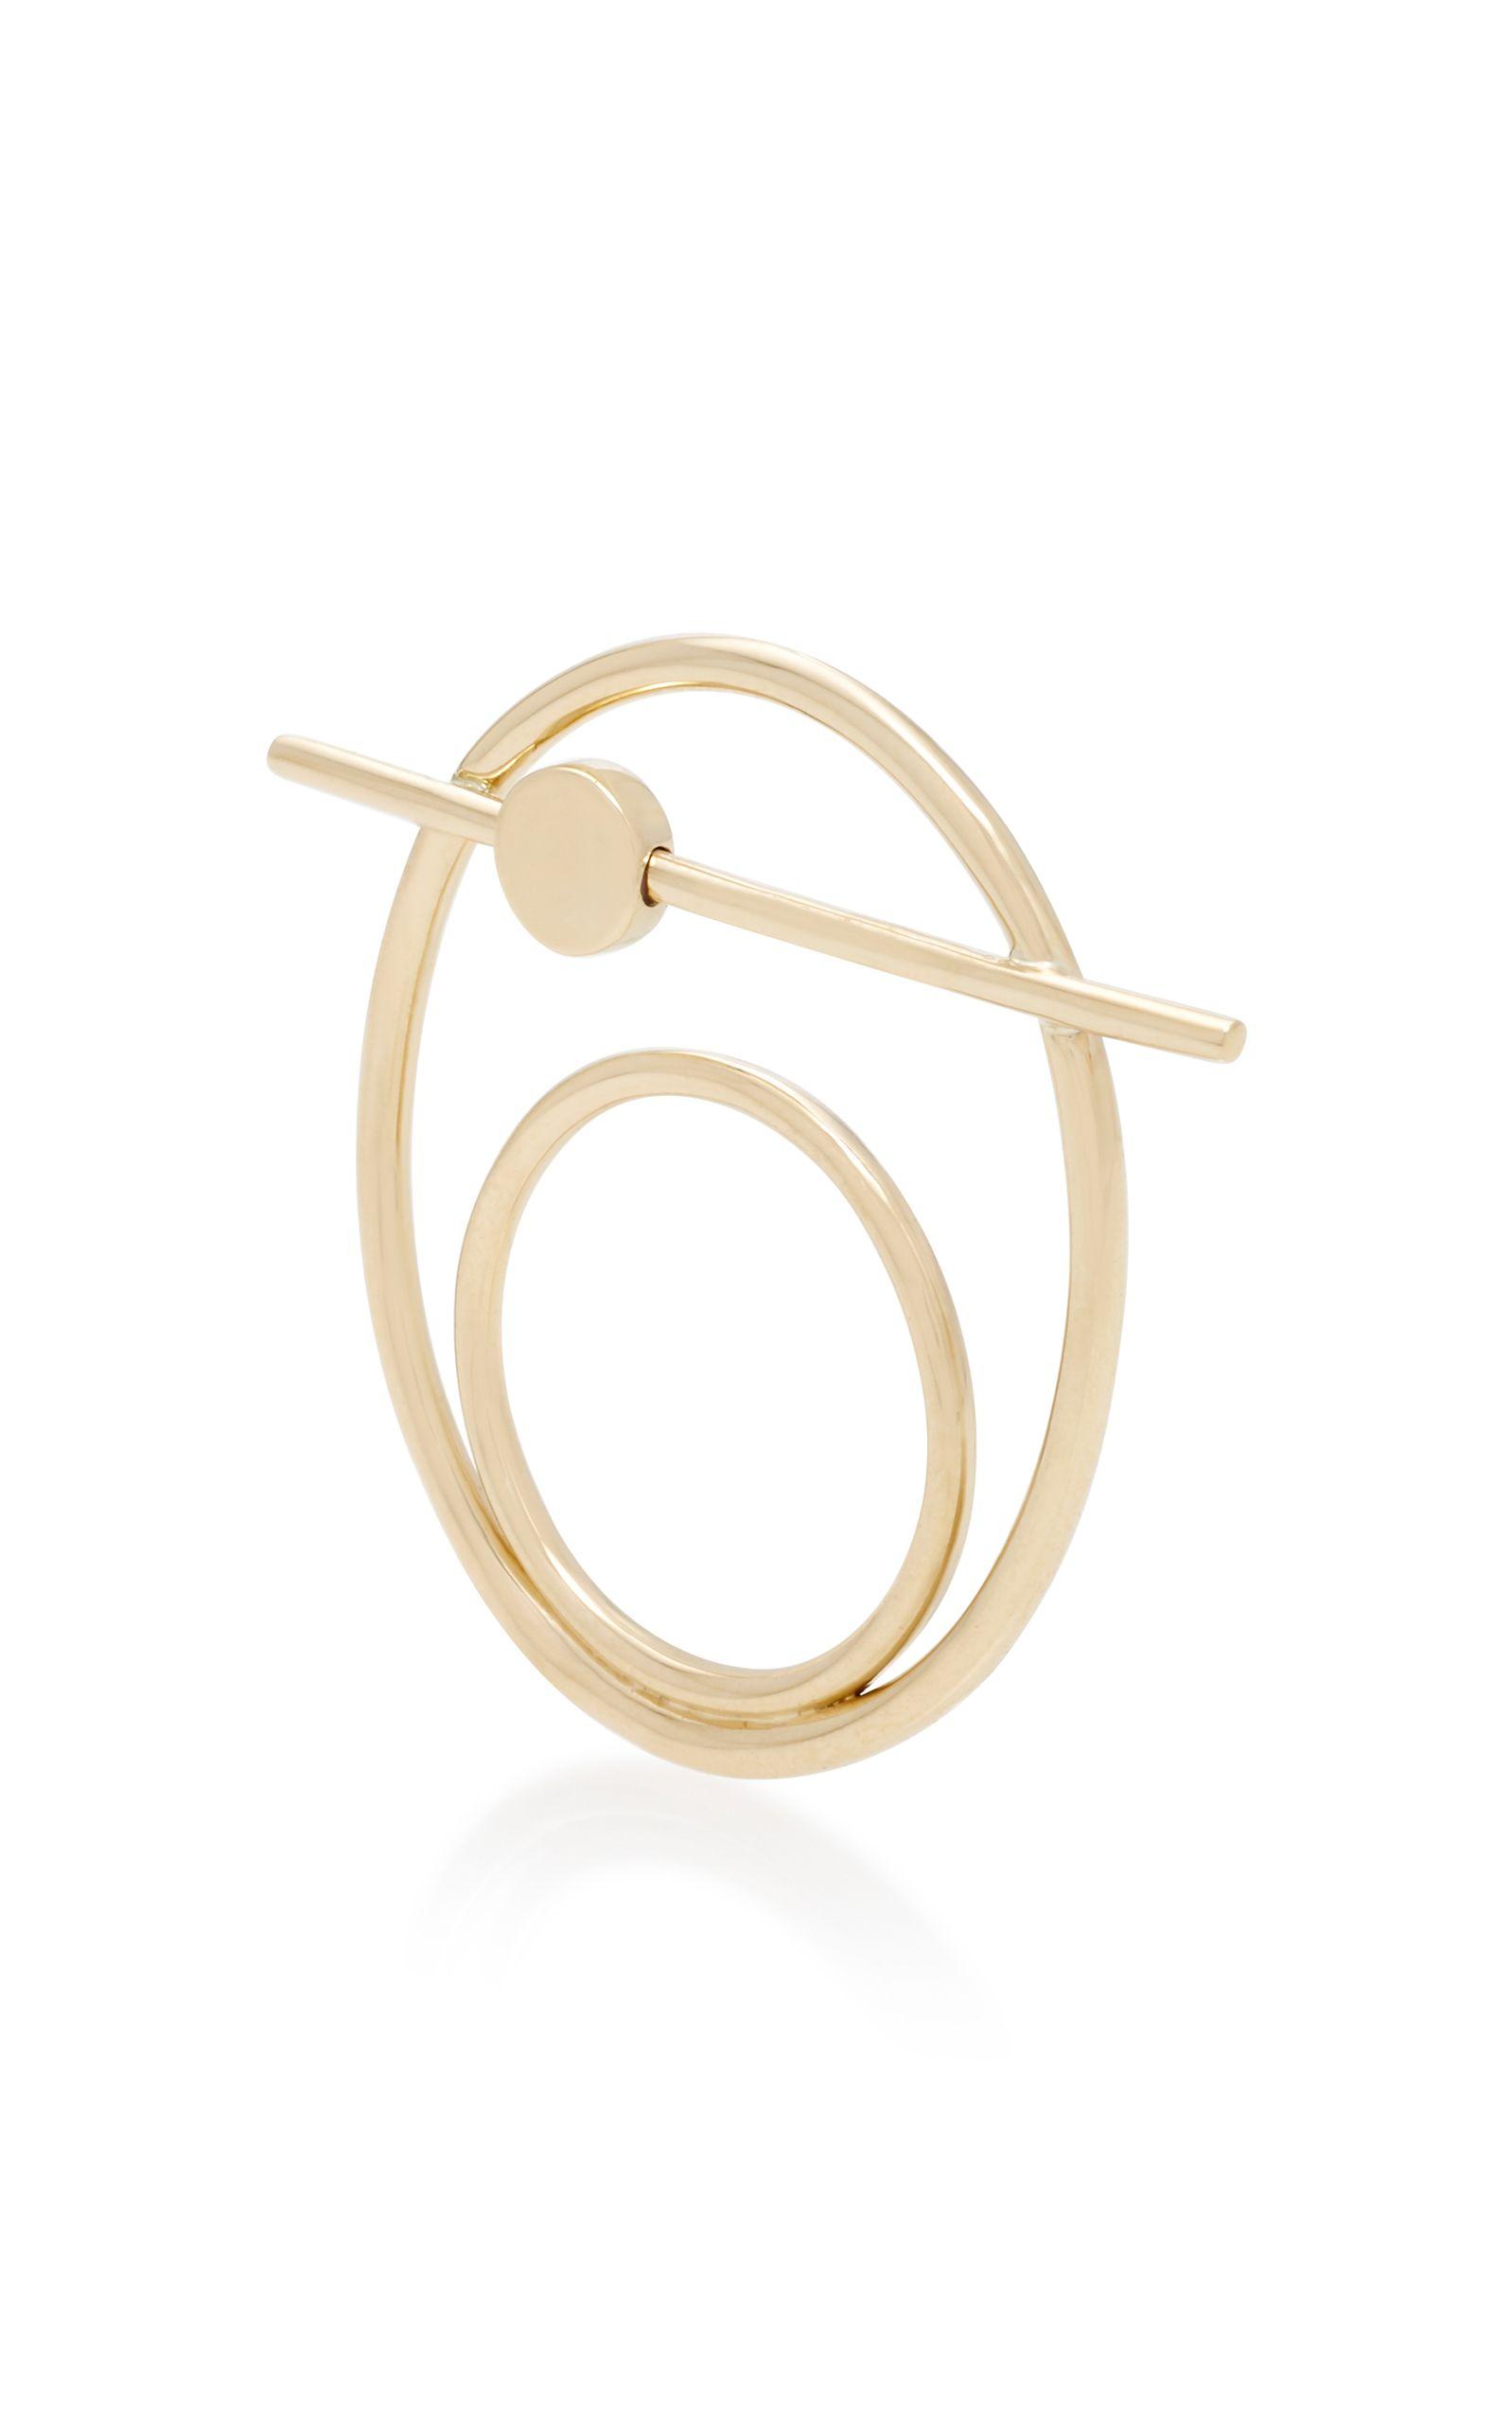 Suno I 10K Gold Ring Pili Restrepo teev86sXe